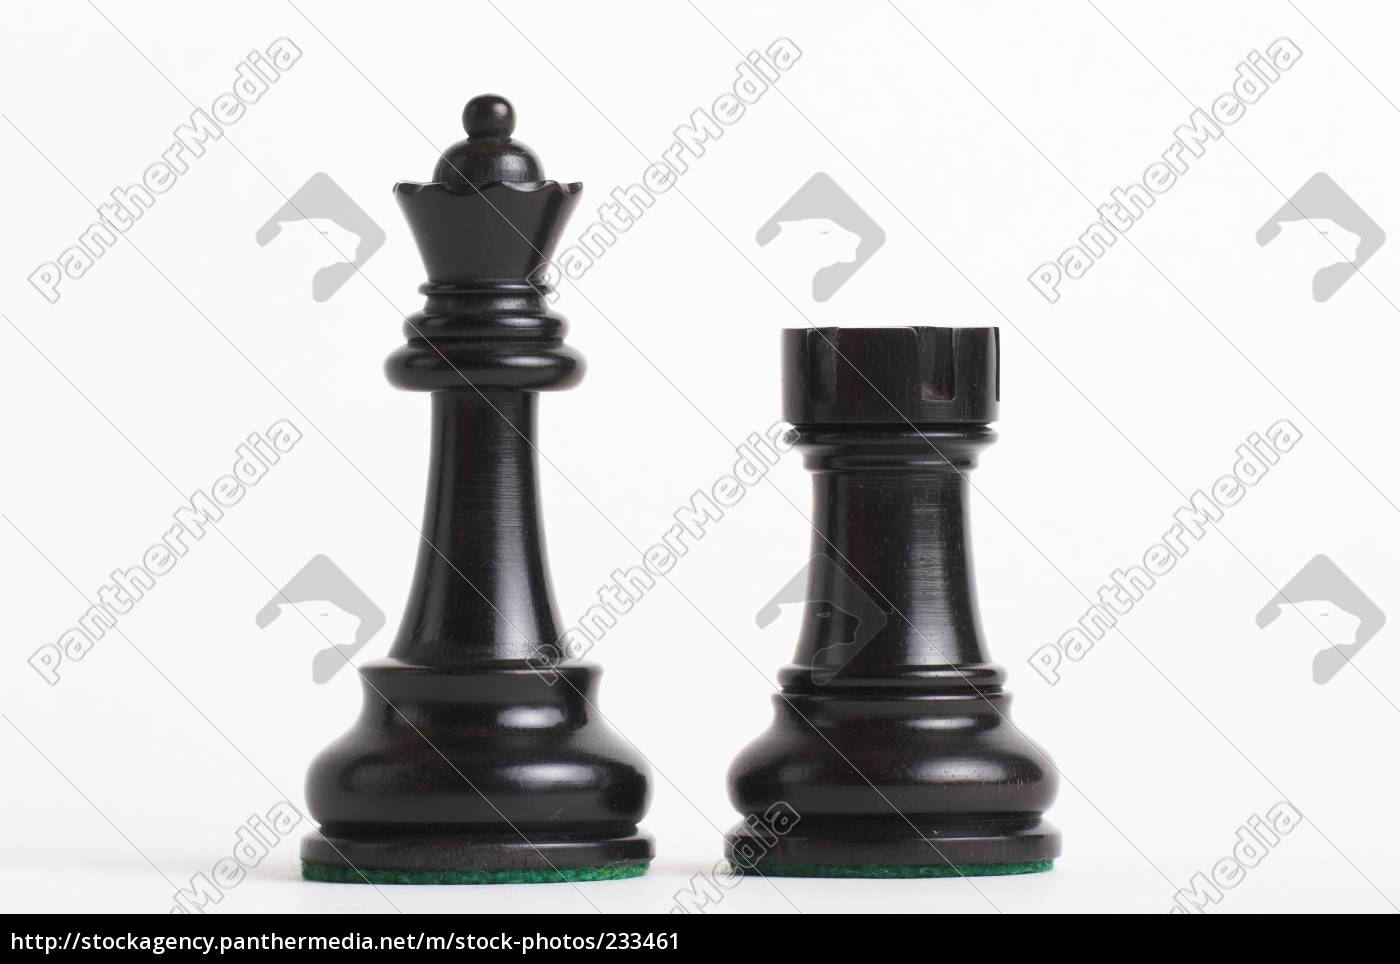 swarze, lady, black, tum, frontal - 233461